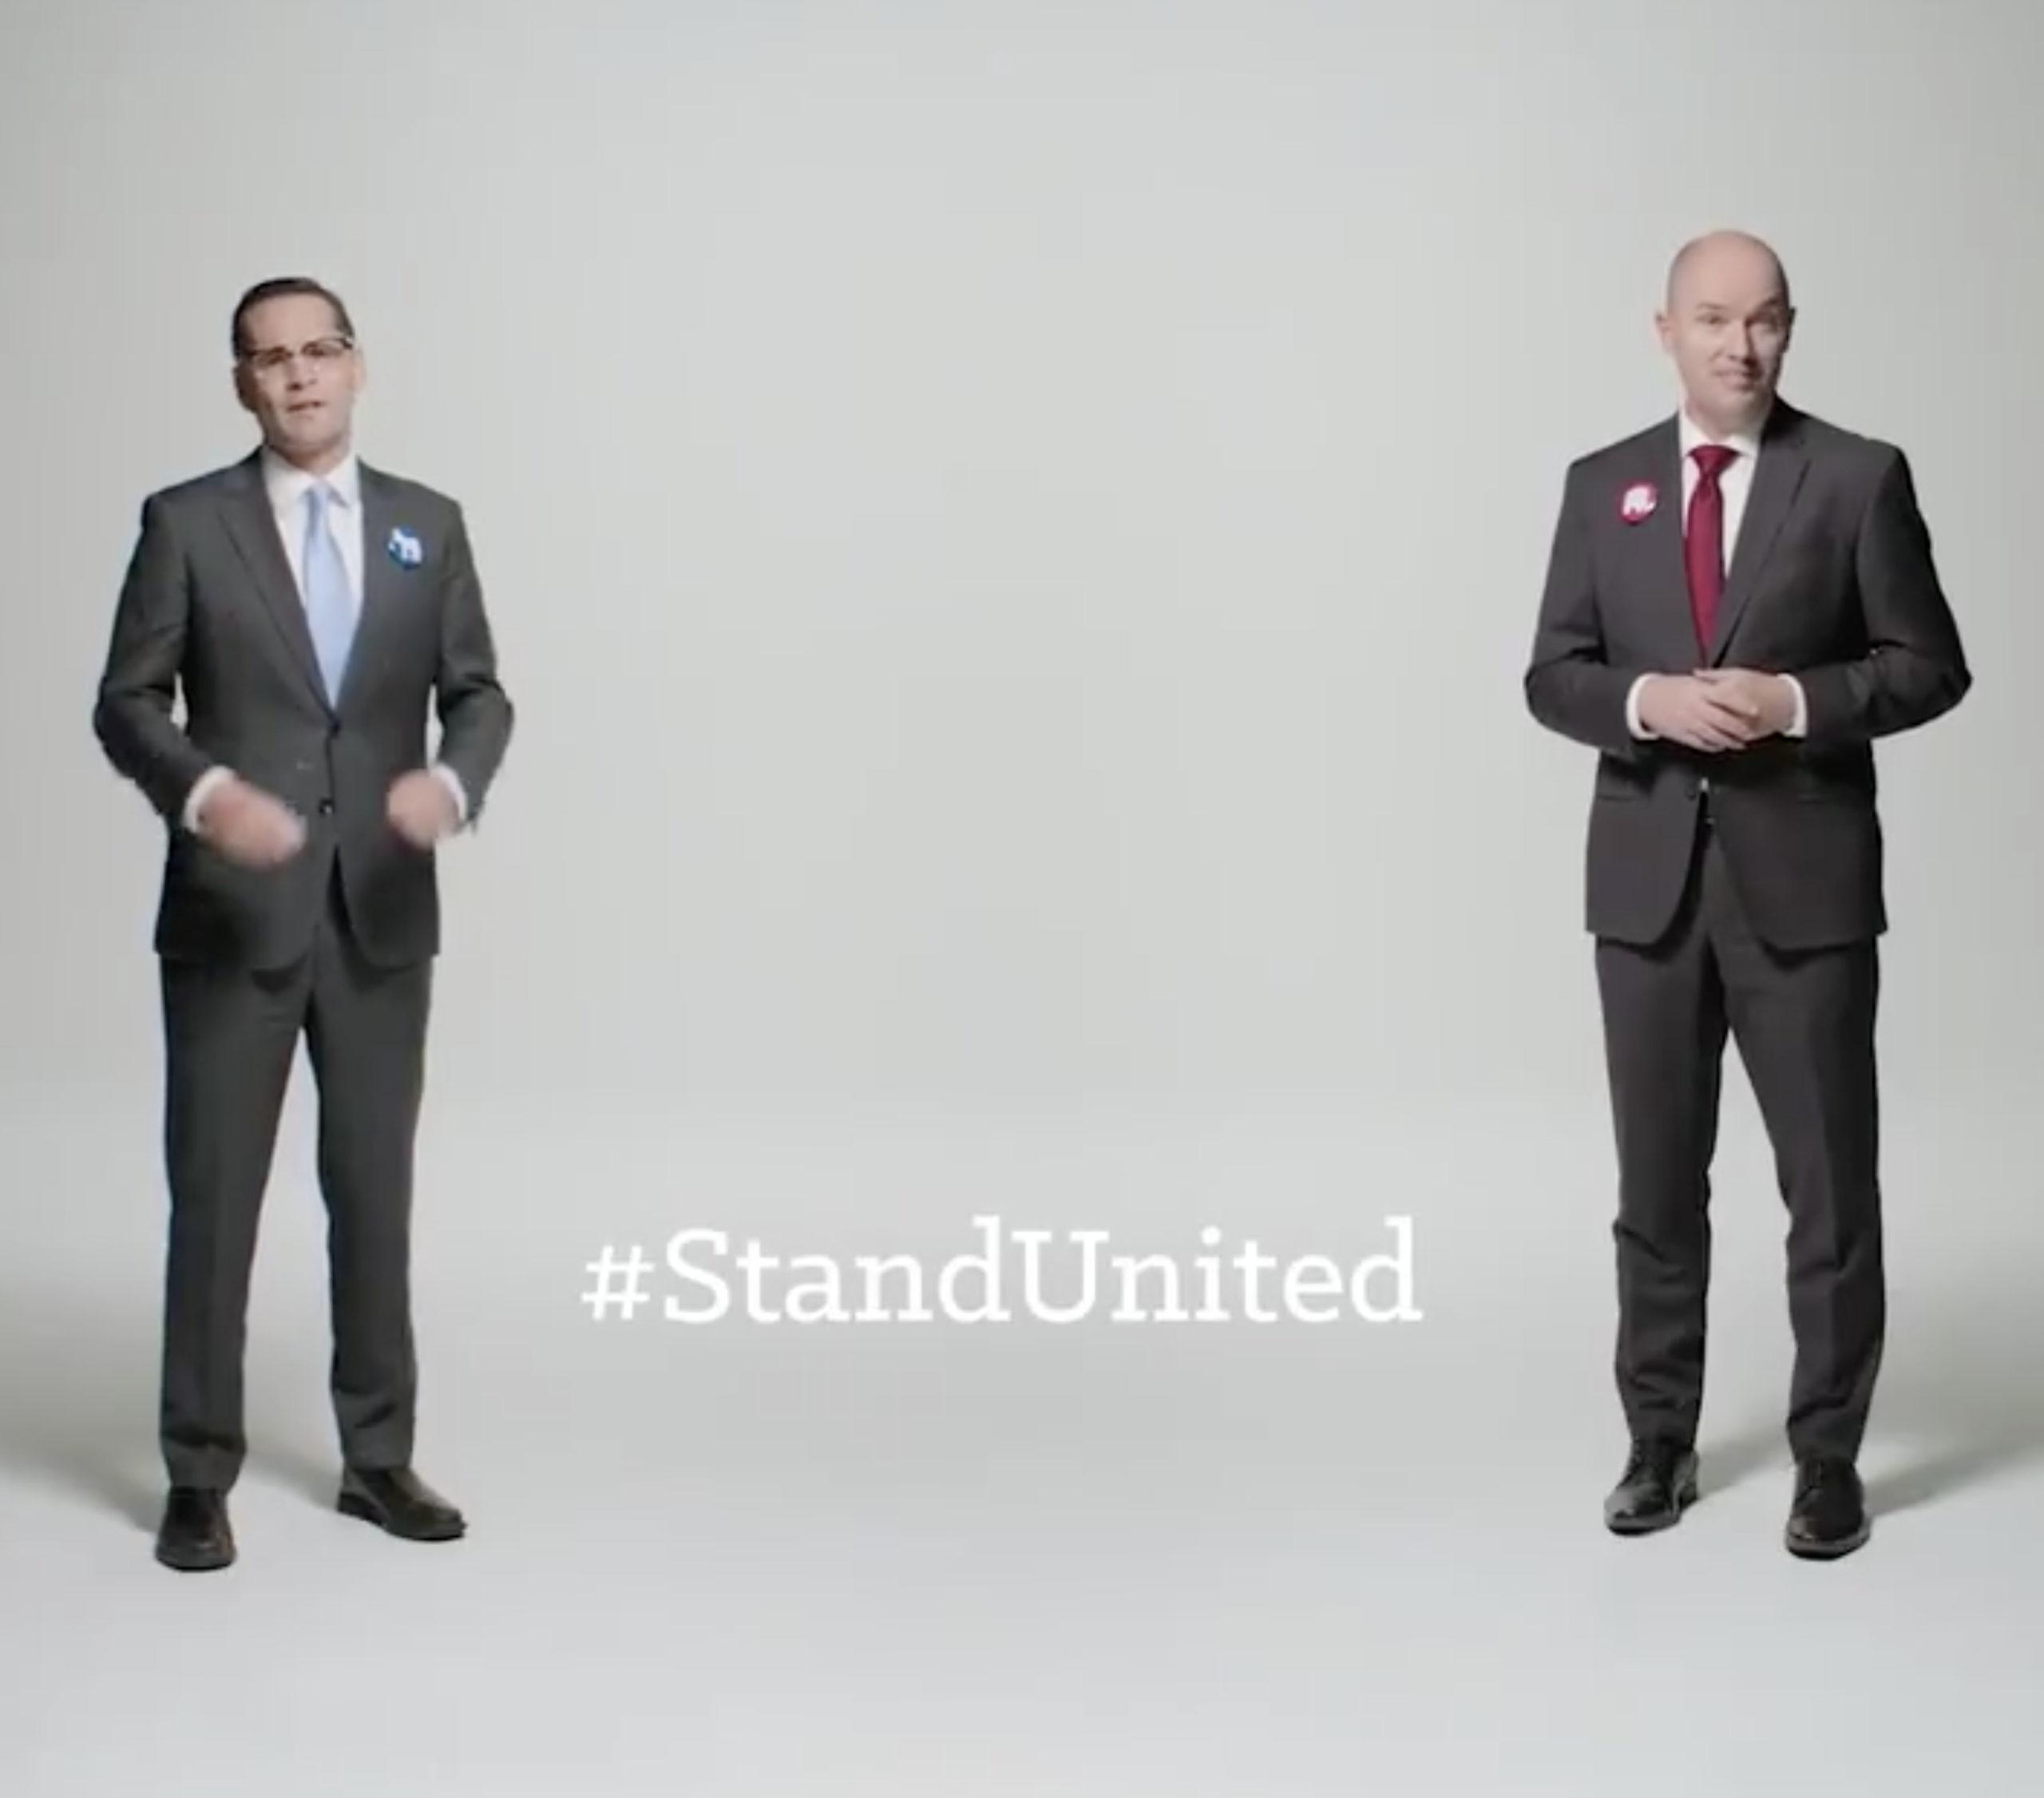 #StandUnited: Utah gubernatorial opponents promote unity in political ads